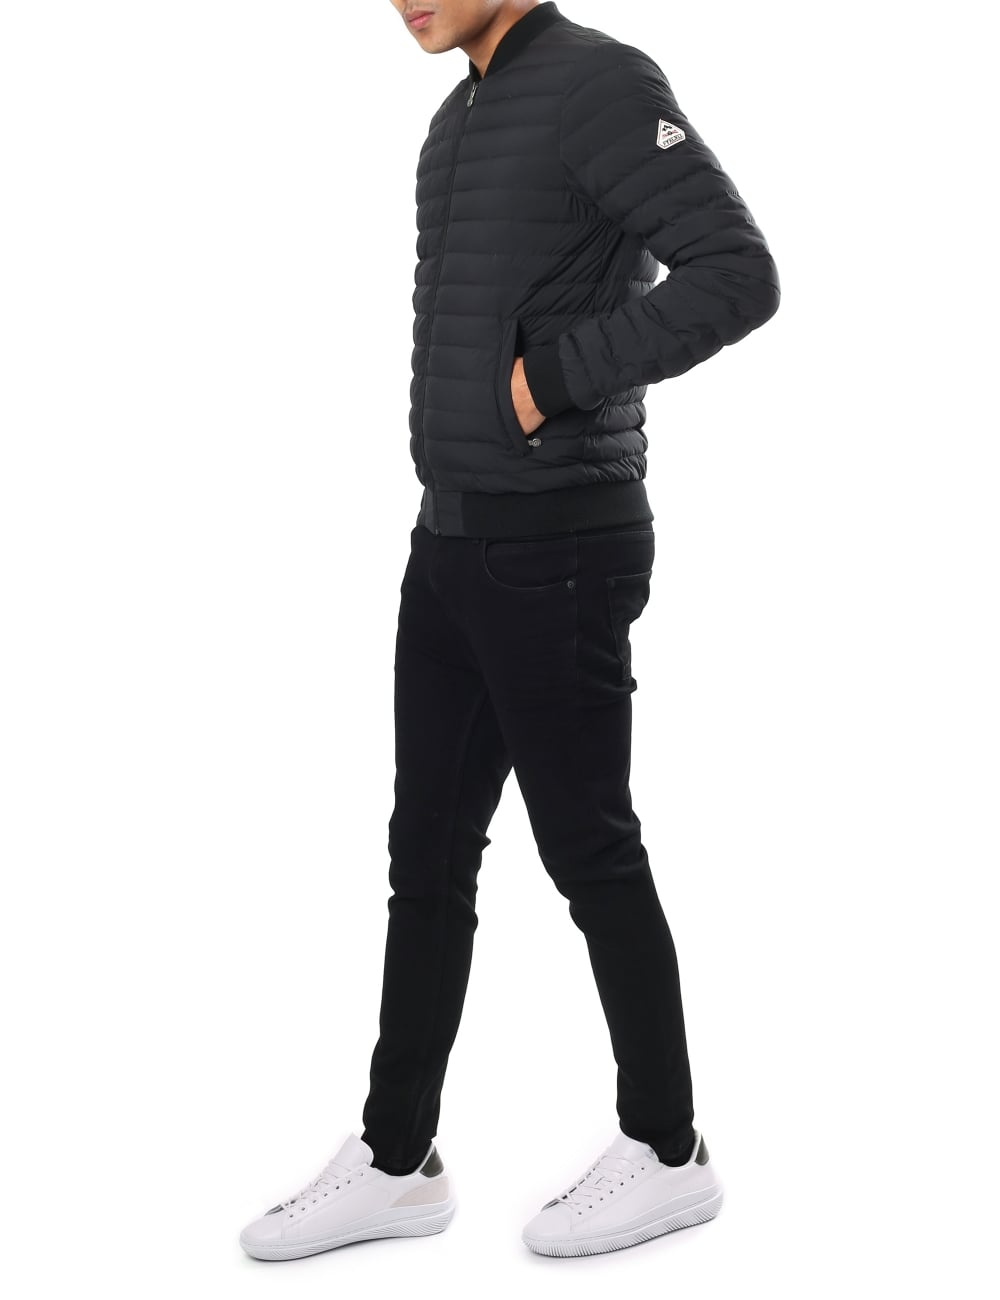 36a9235b5 Pyrenex Men's Bruno Jacket